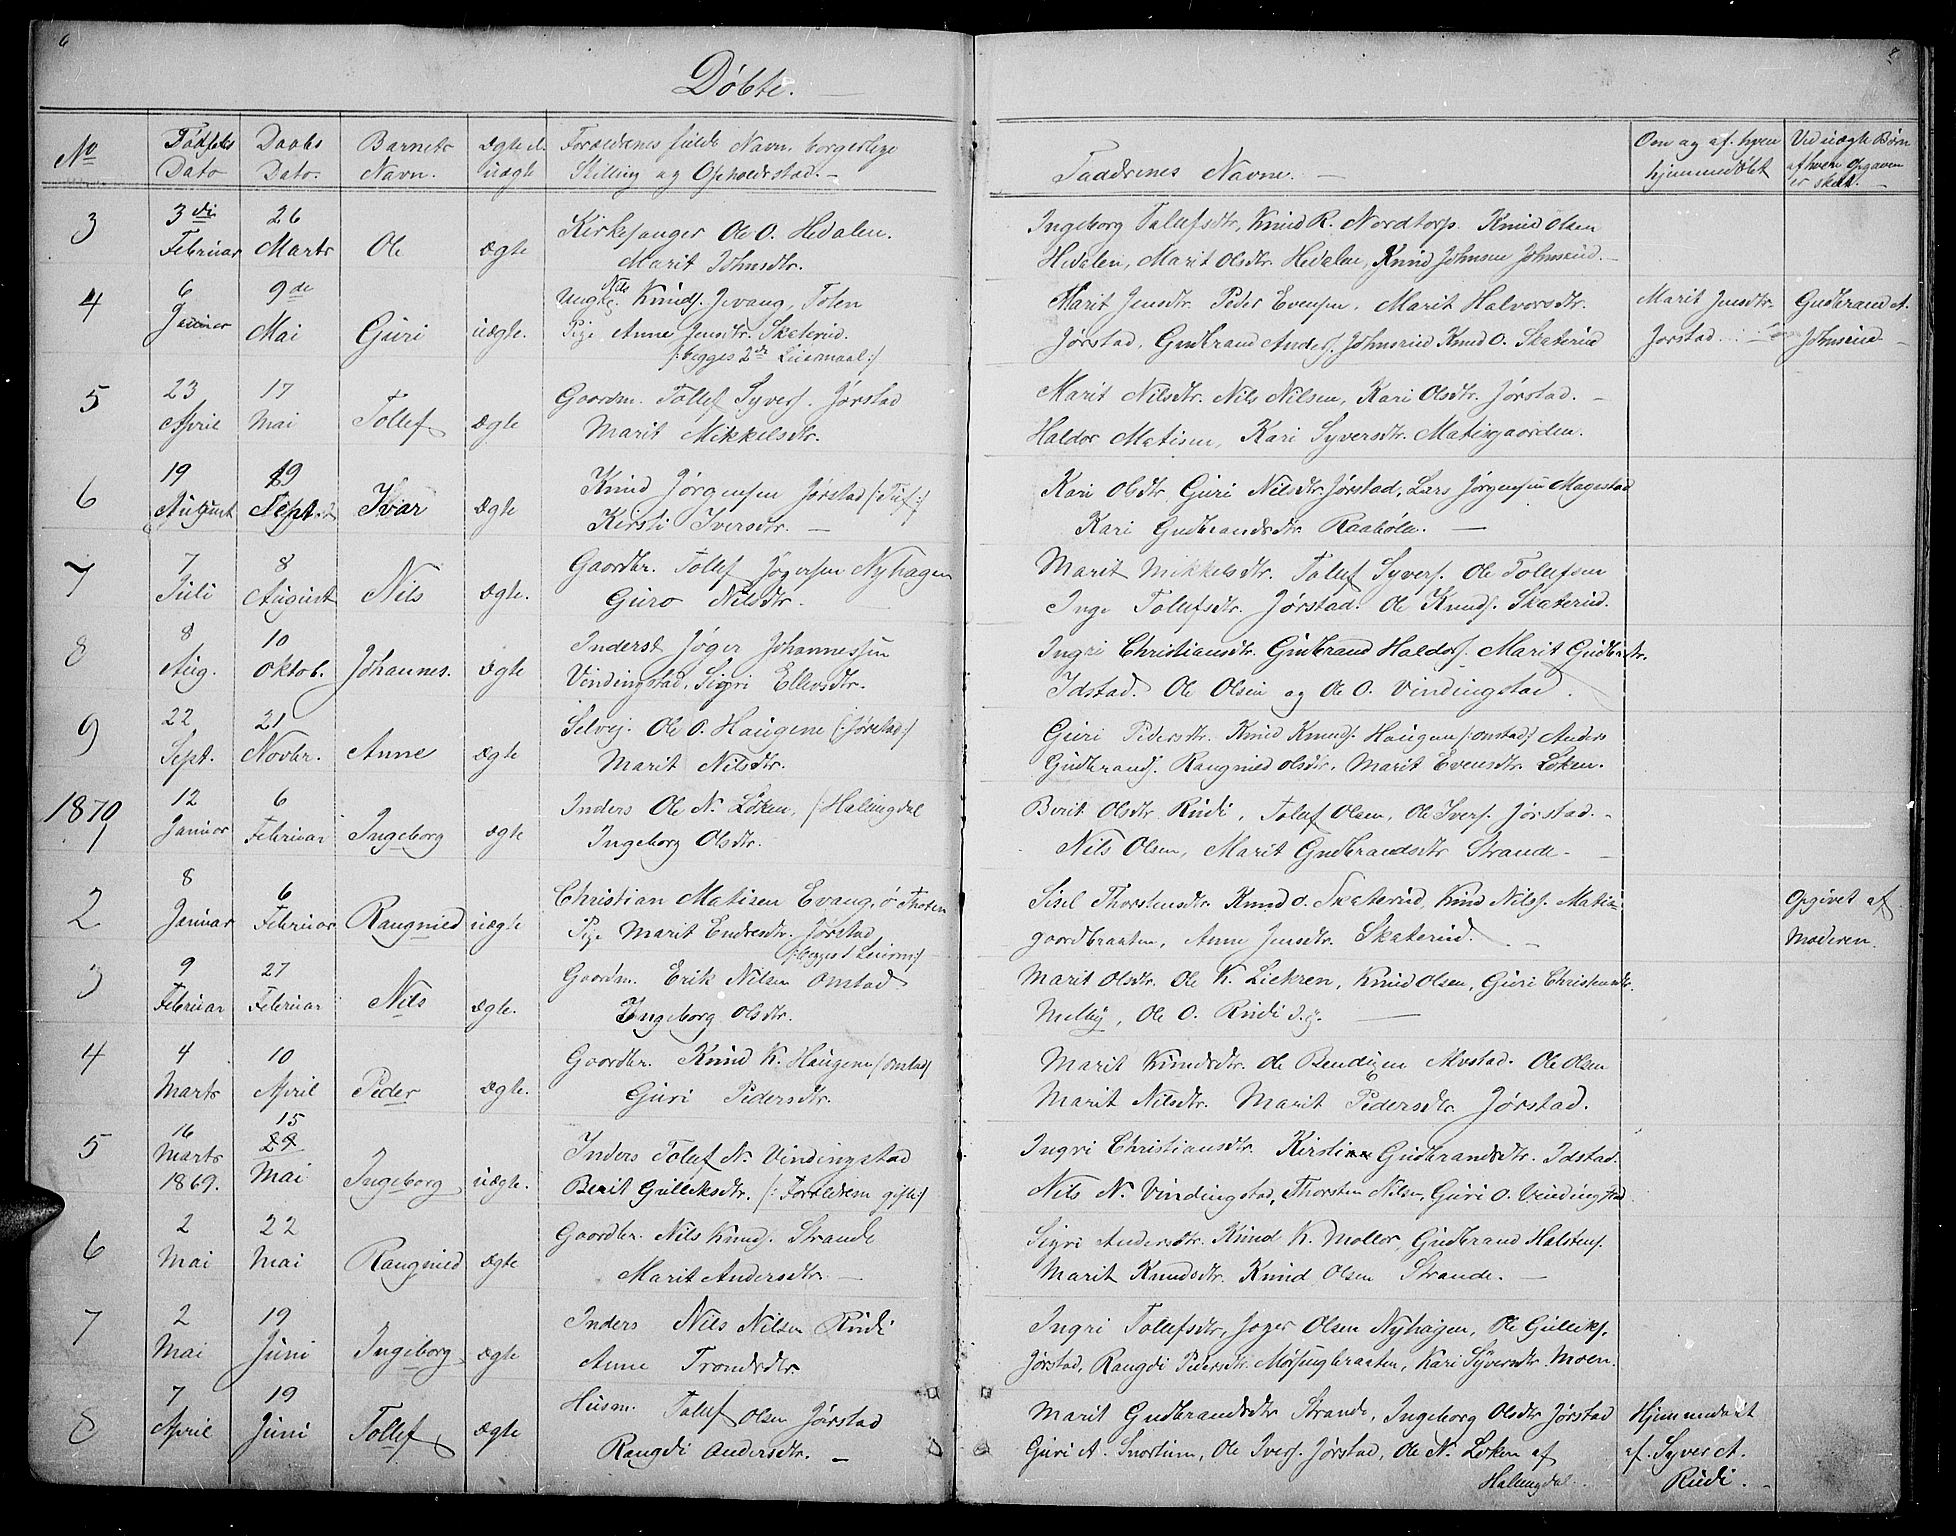 SAH, Øystre Slidre prestekontor, Klokkerbok nr. 2, 1866-1886, s. 6-7